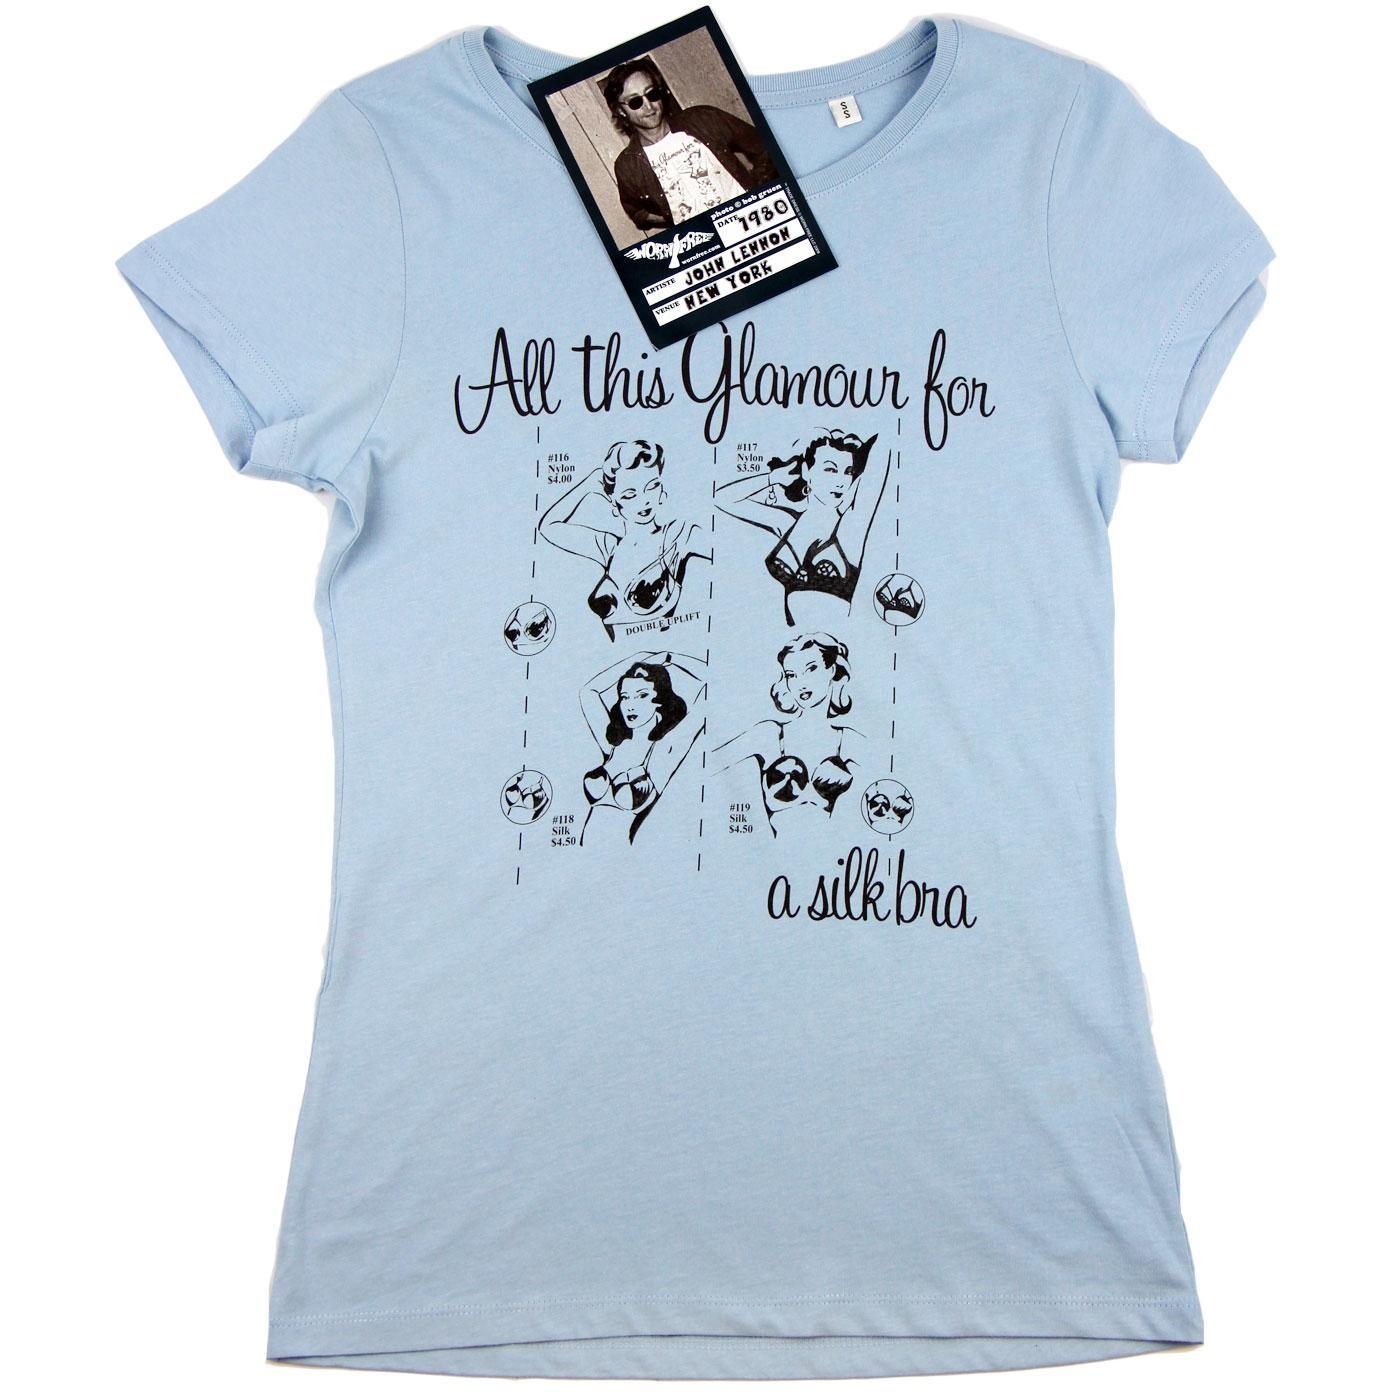 WORN FREE John Lennon Glamour Retro Indie T-Shirt